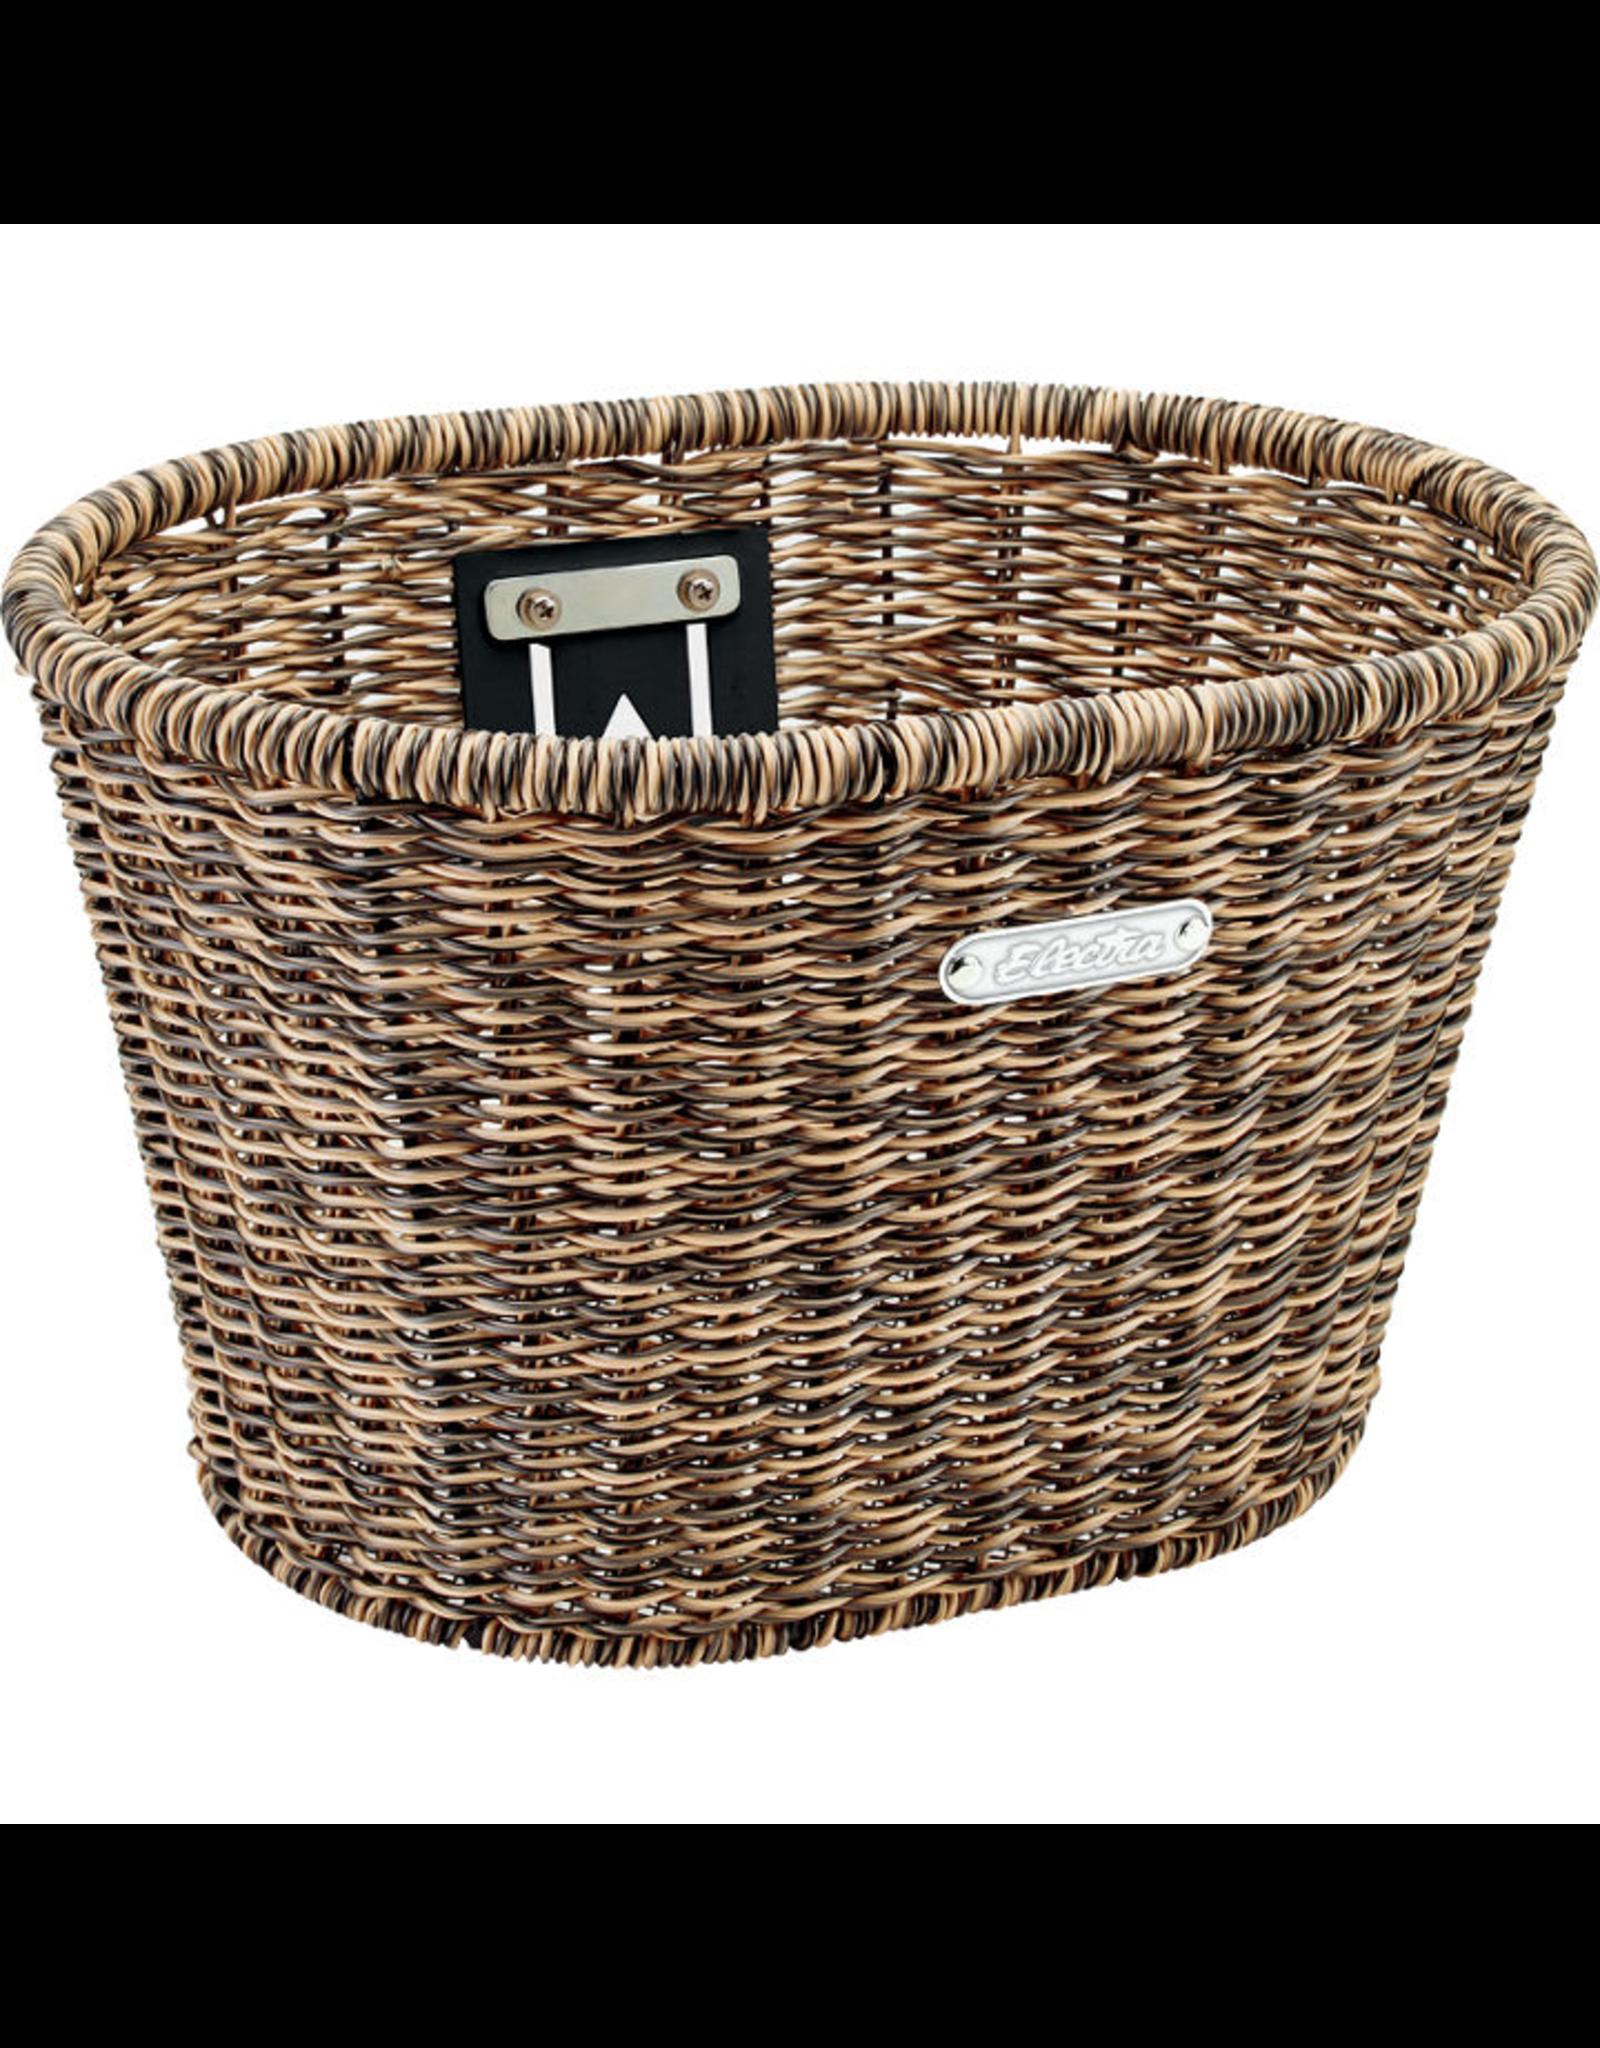 Electra Electra  Front Basket - Plastic Woven Light Brown/Black